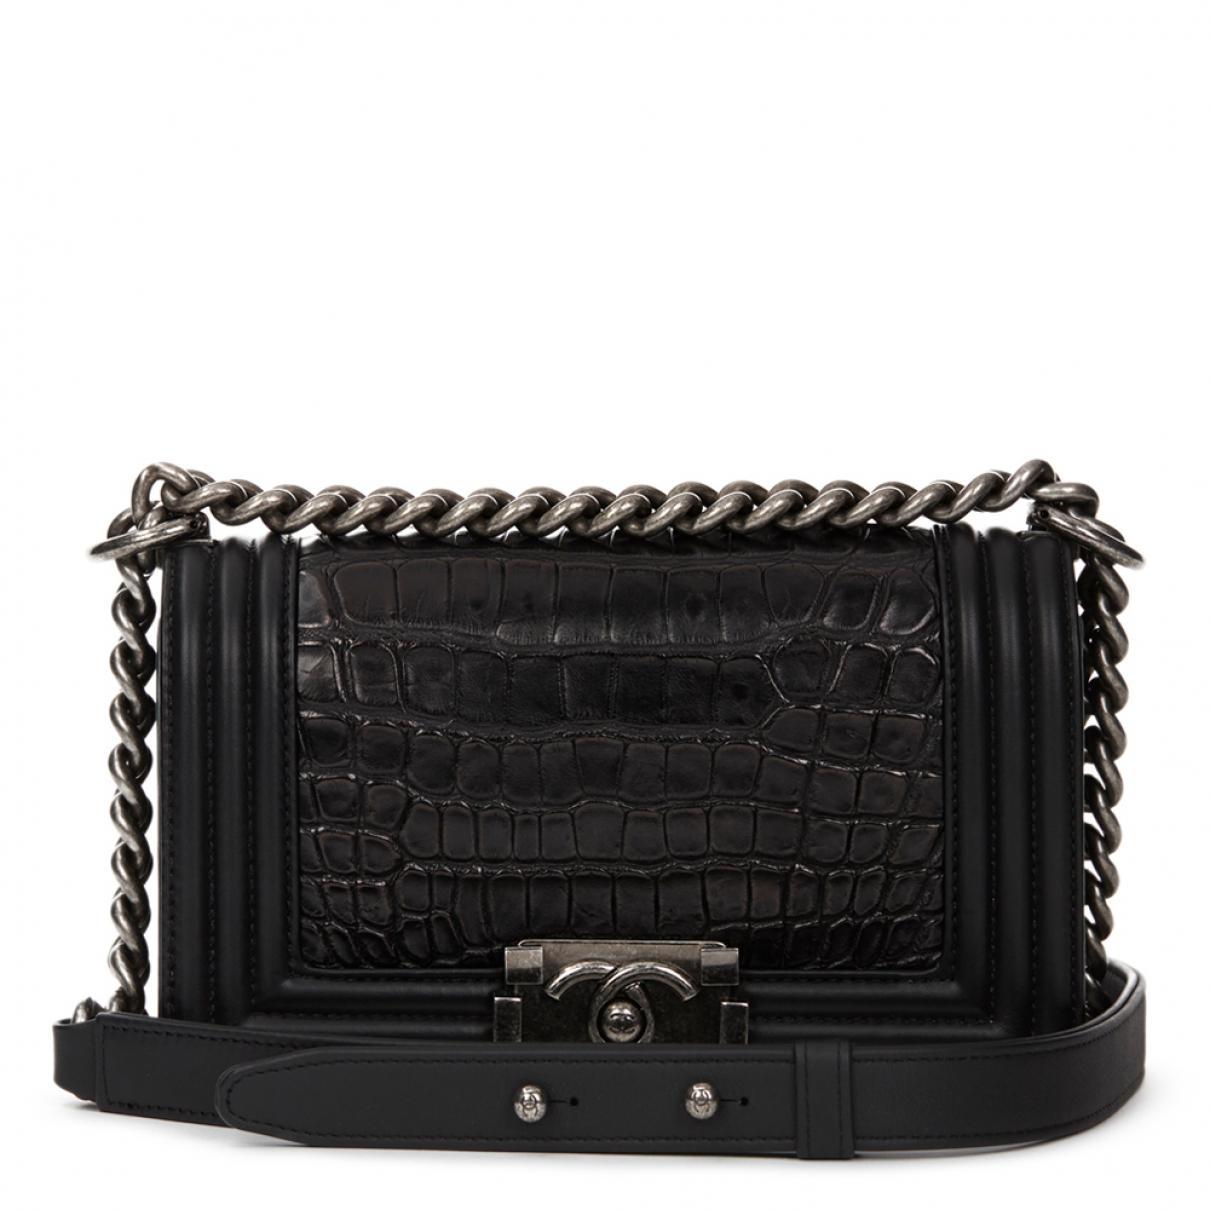 2a2d0805676e Chanel Pre-owned Boy Alligator Handbag in Black - Lyst